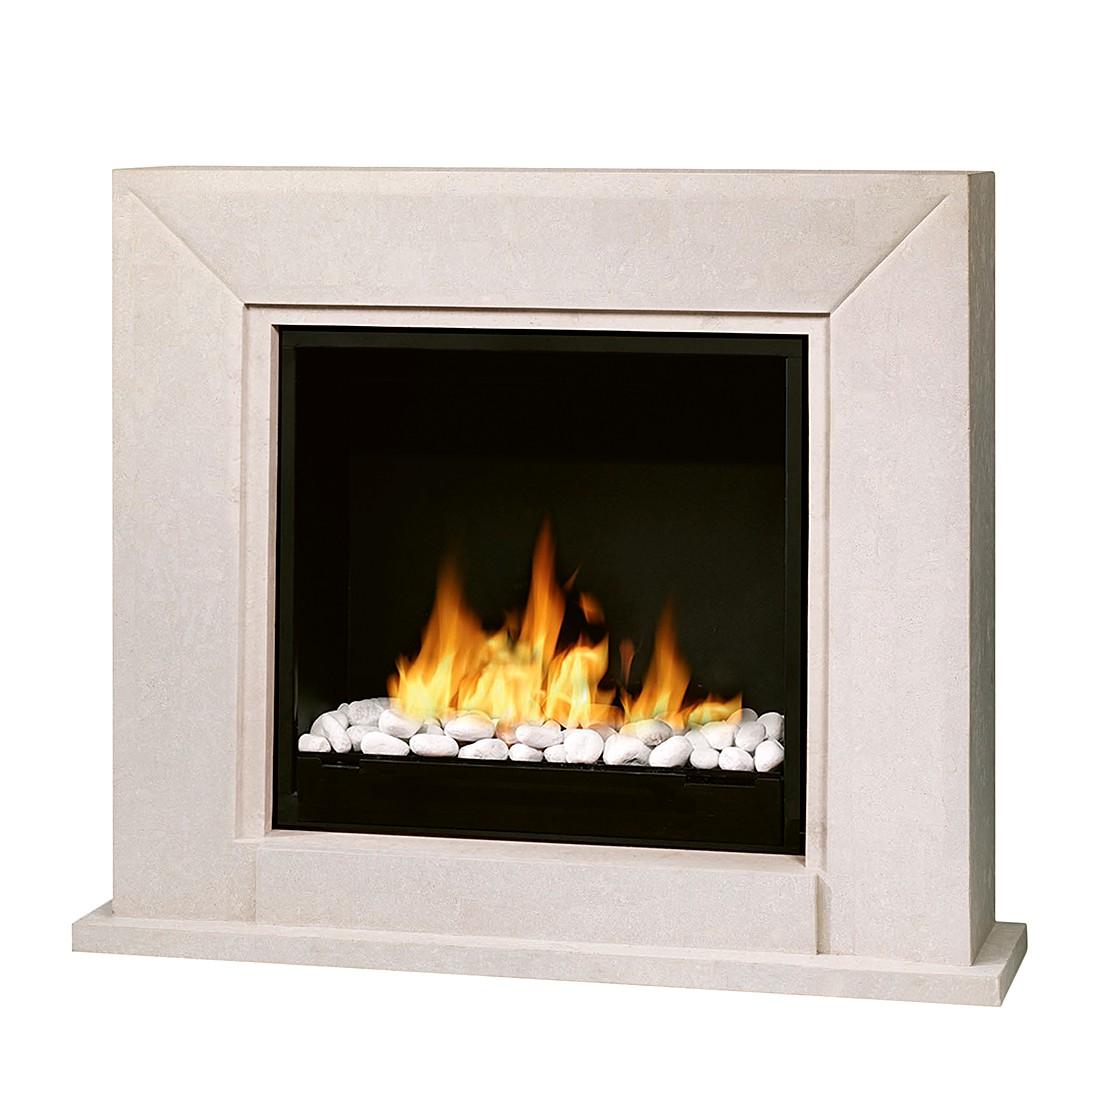 Home Hardware Foyer Ethanol : Vente cheminee tritoo maison et jardin